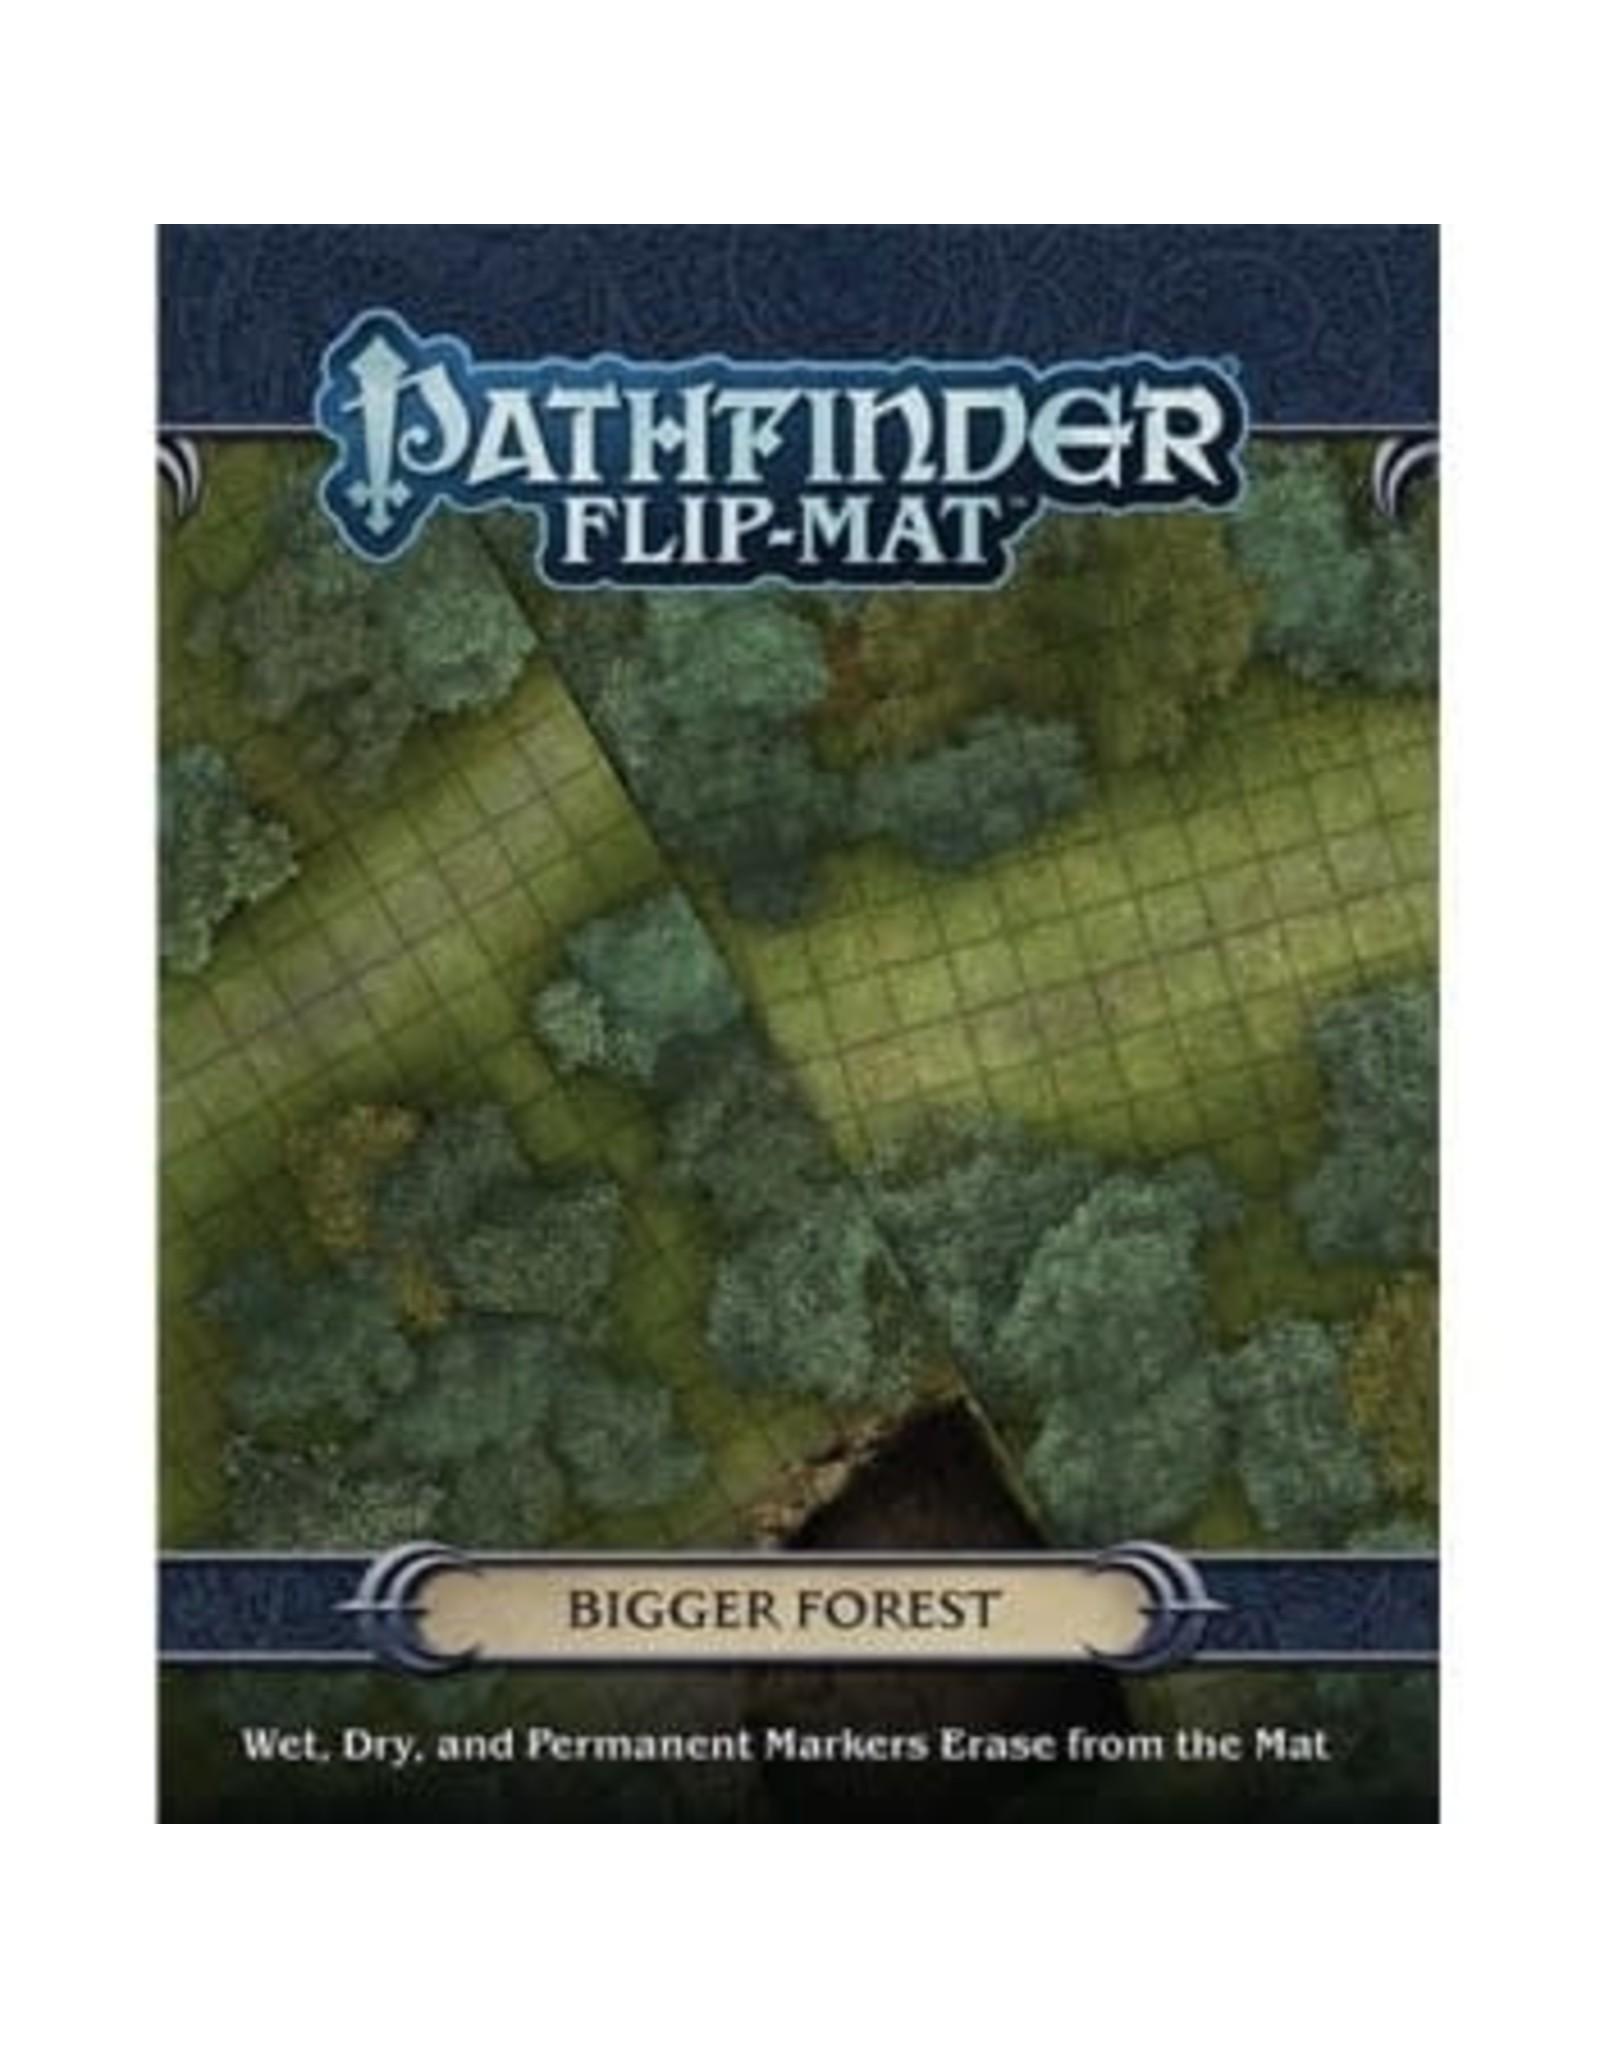 Pathfinder Flip-Mat